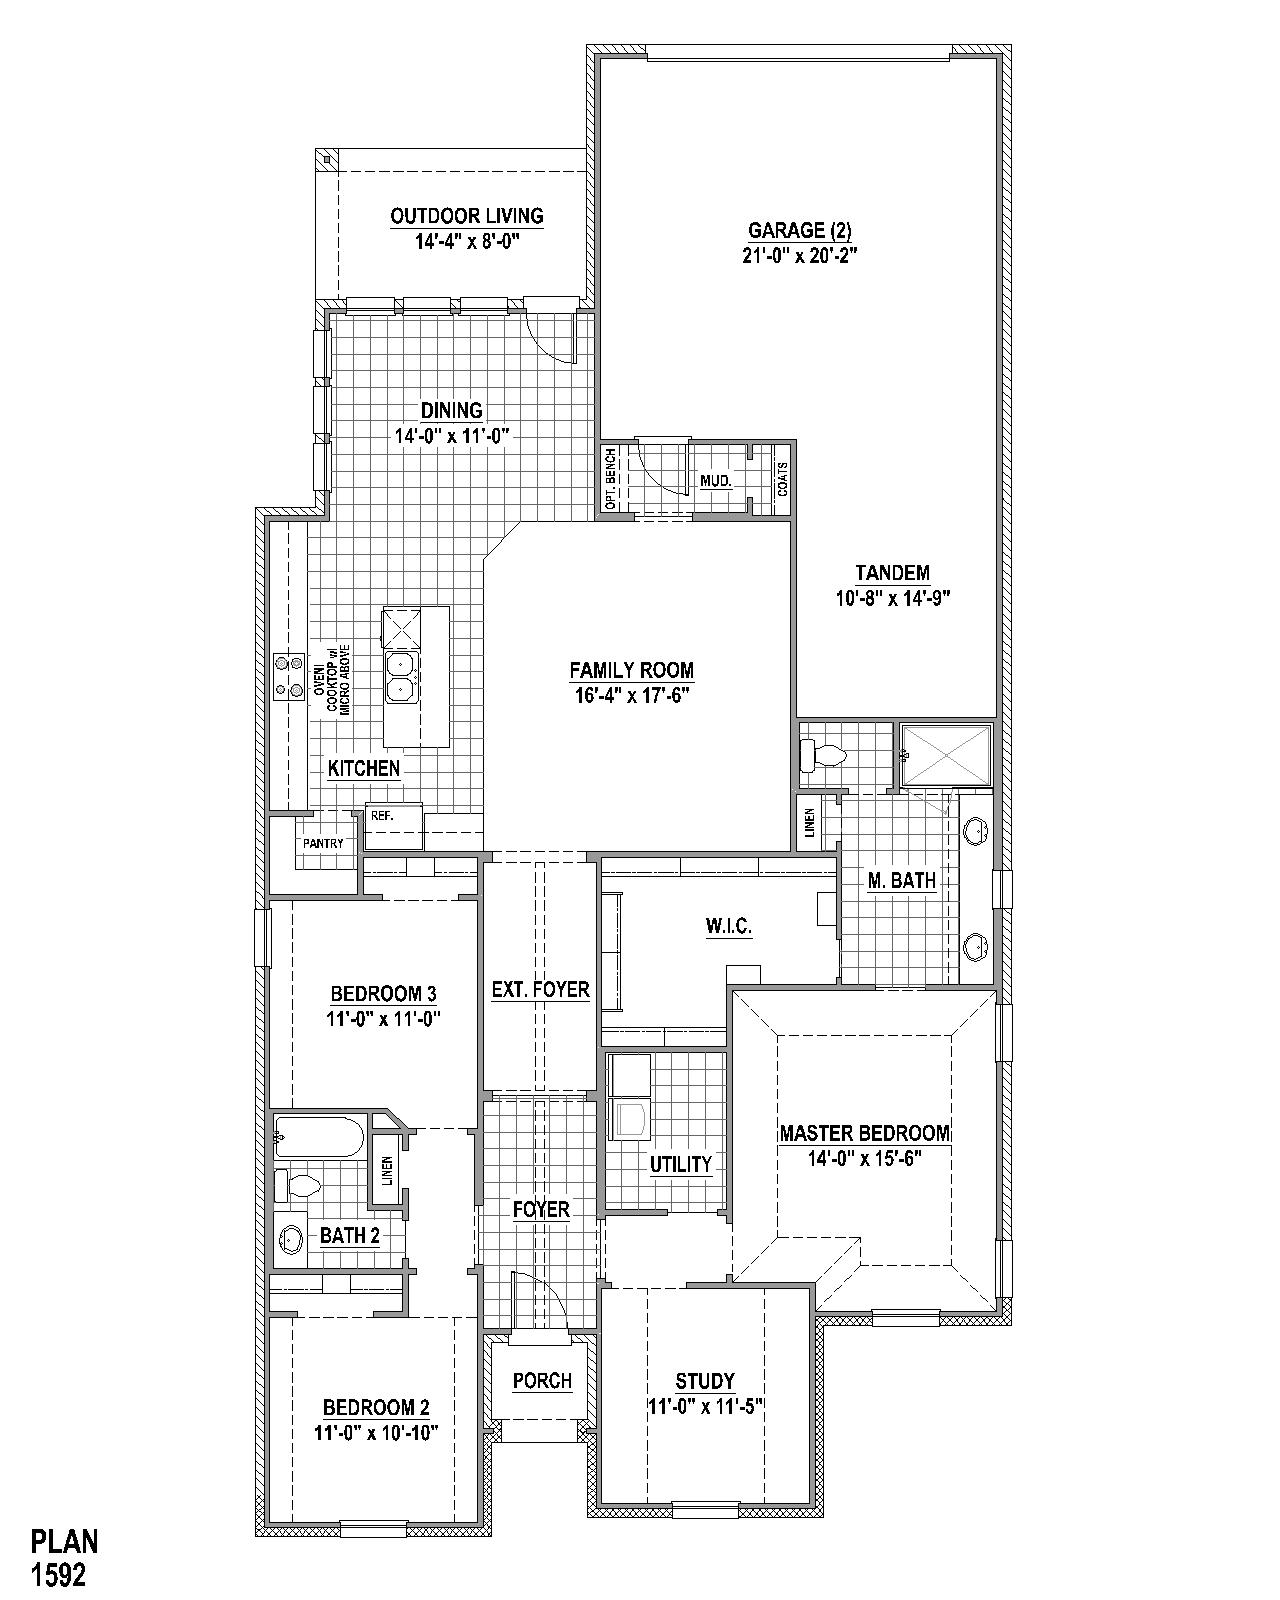 Plan 1592 Floor Plan